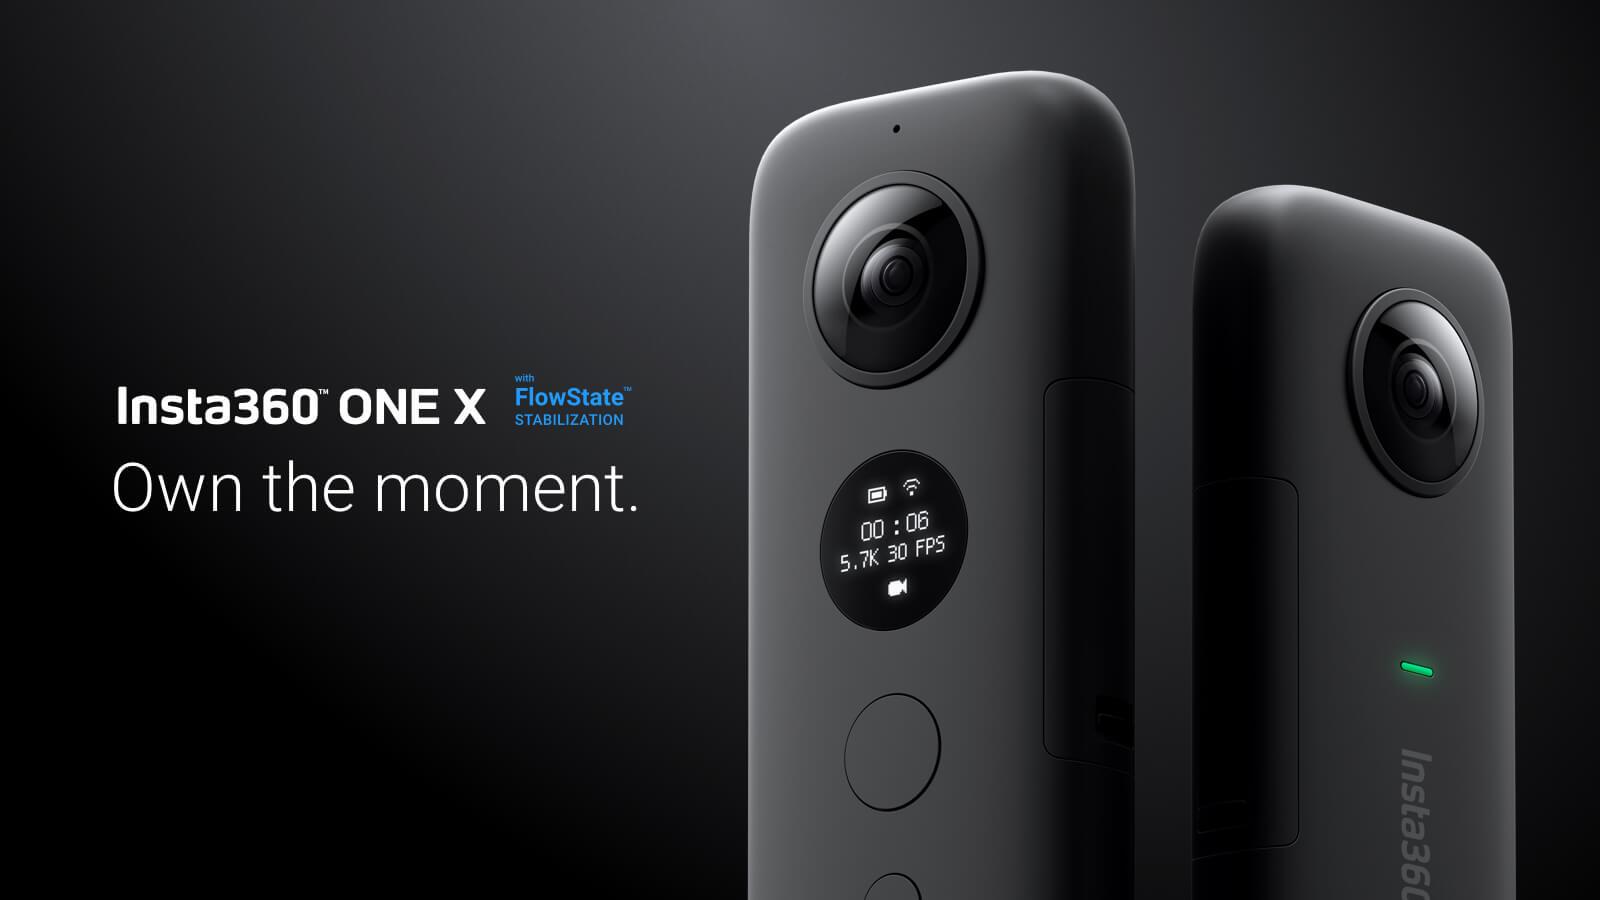 Insta360 ONE X 発表